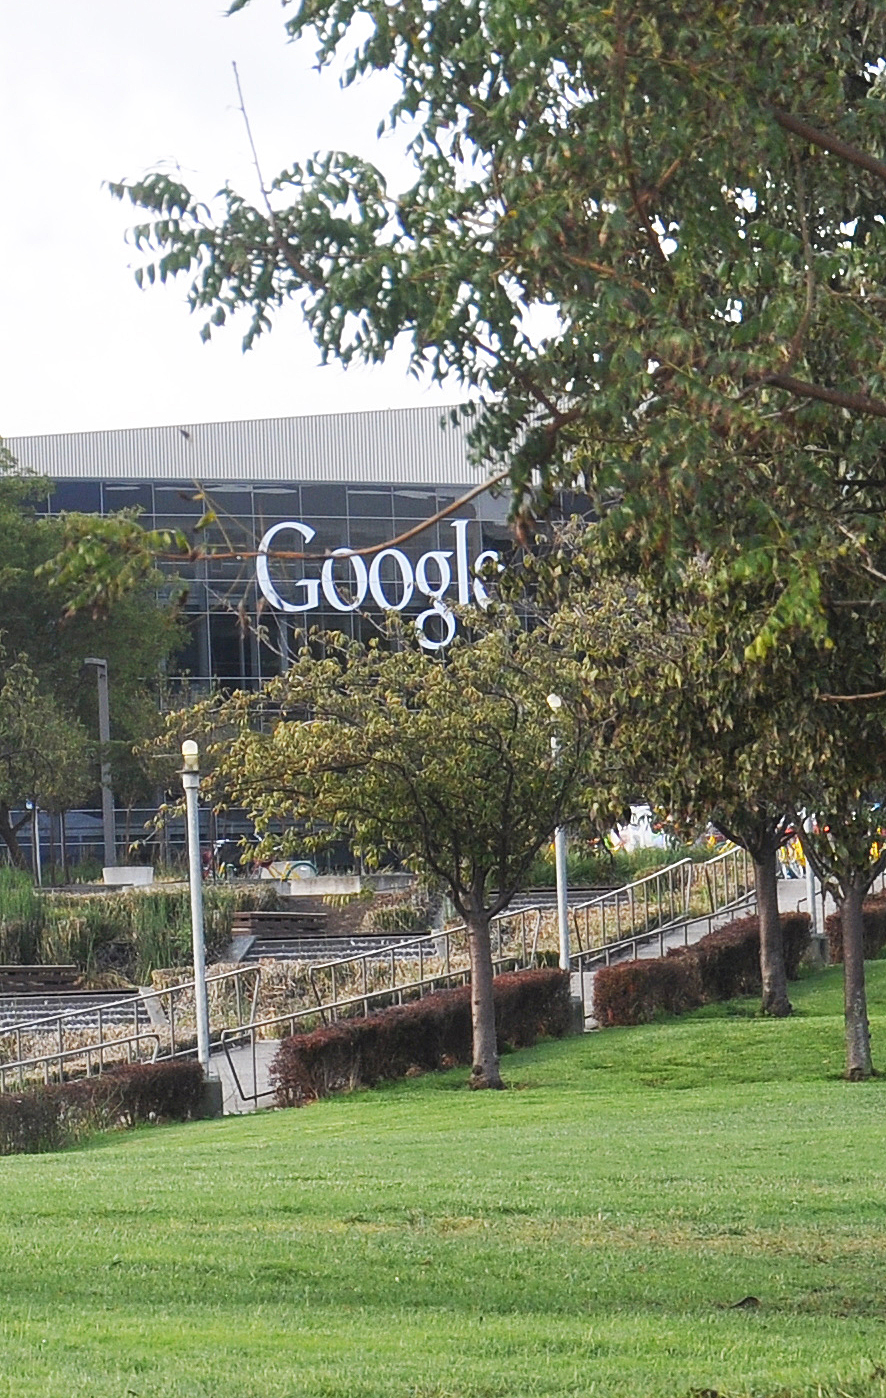 GoogleFar